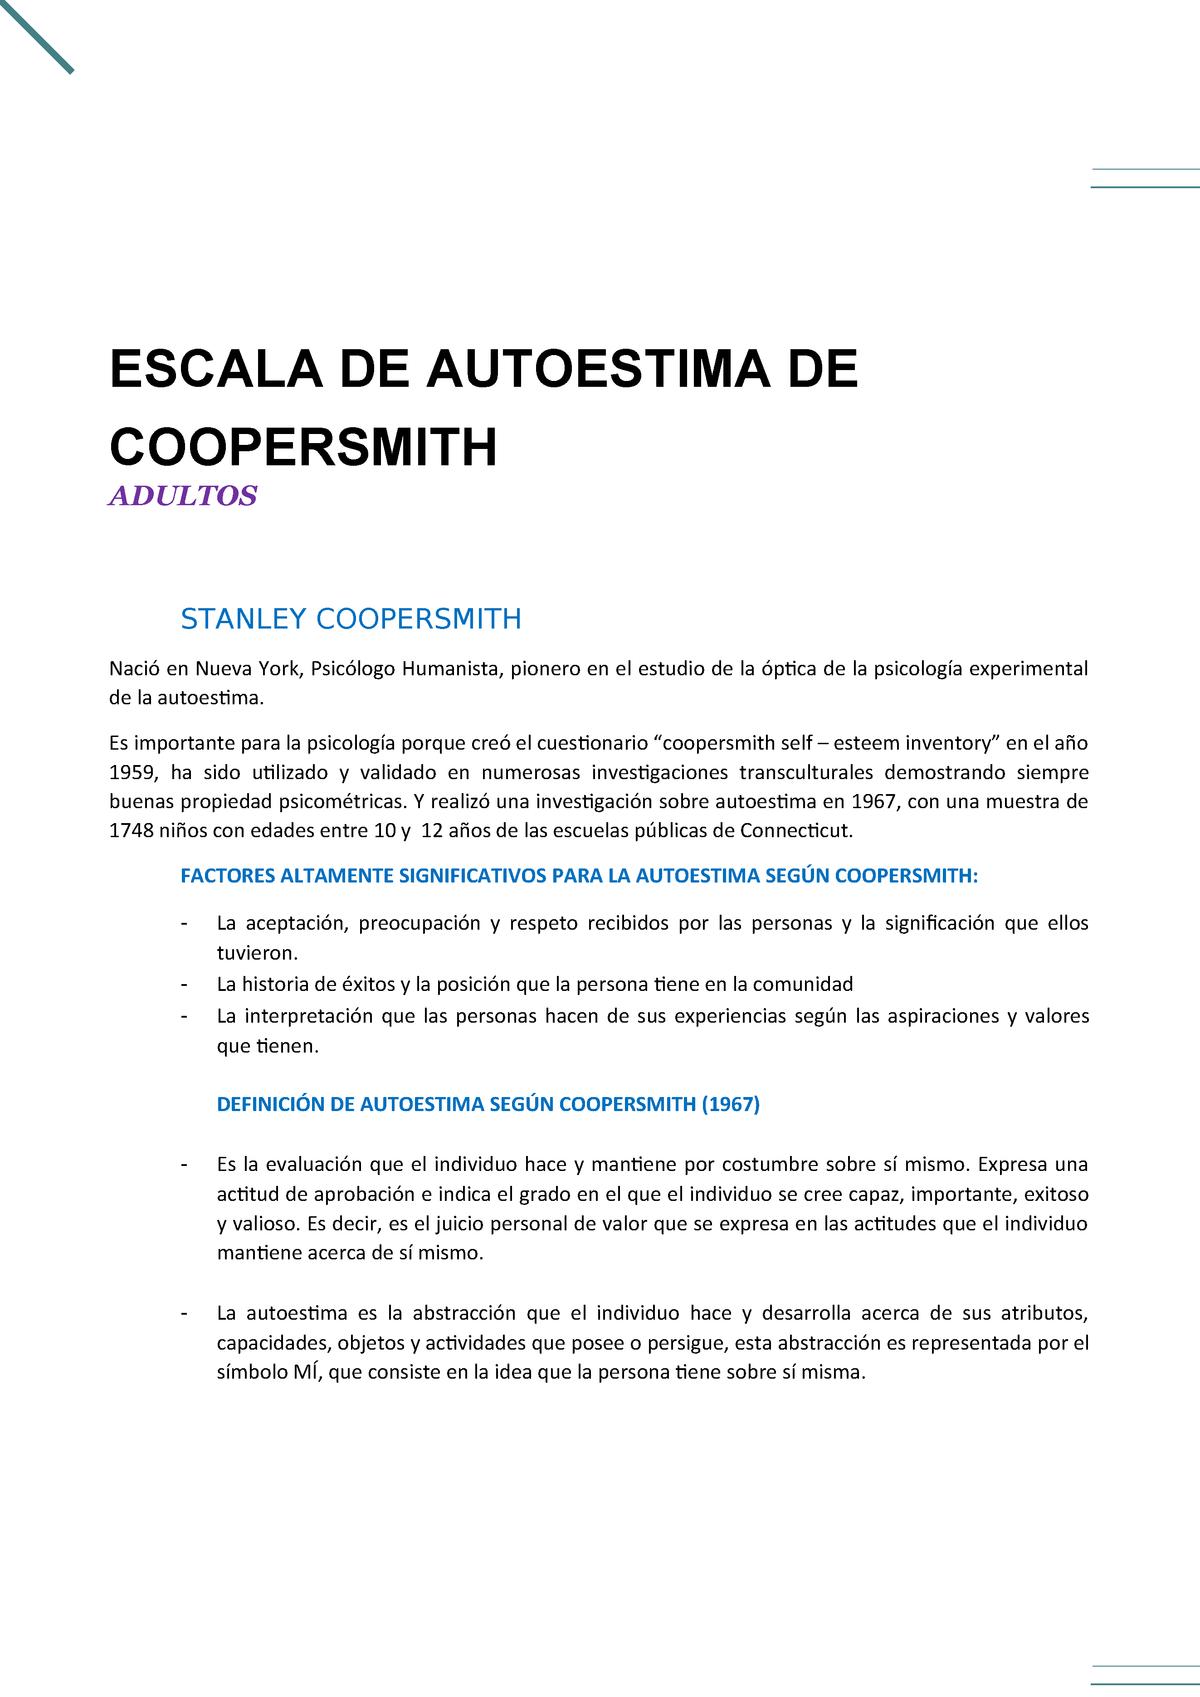 Autoestima Coopersmith Asy Upsjb Studocu